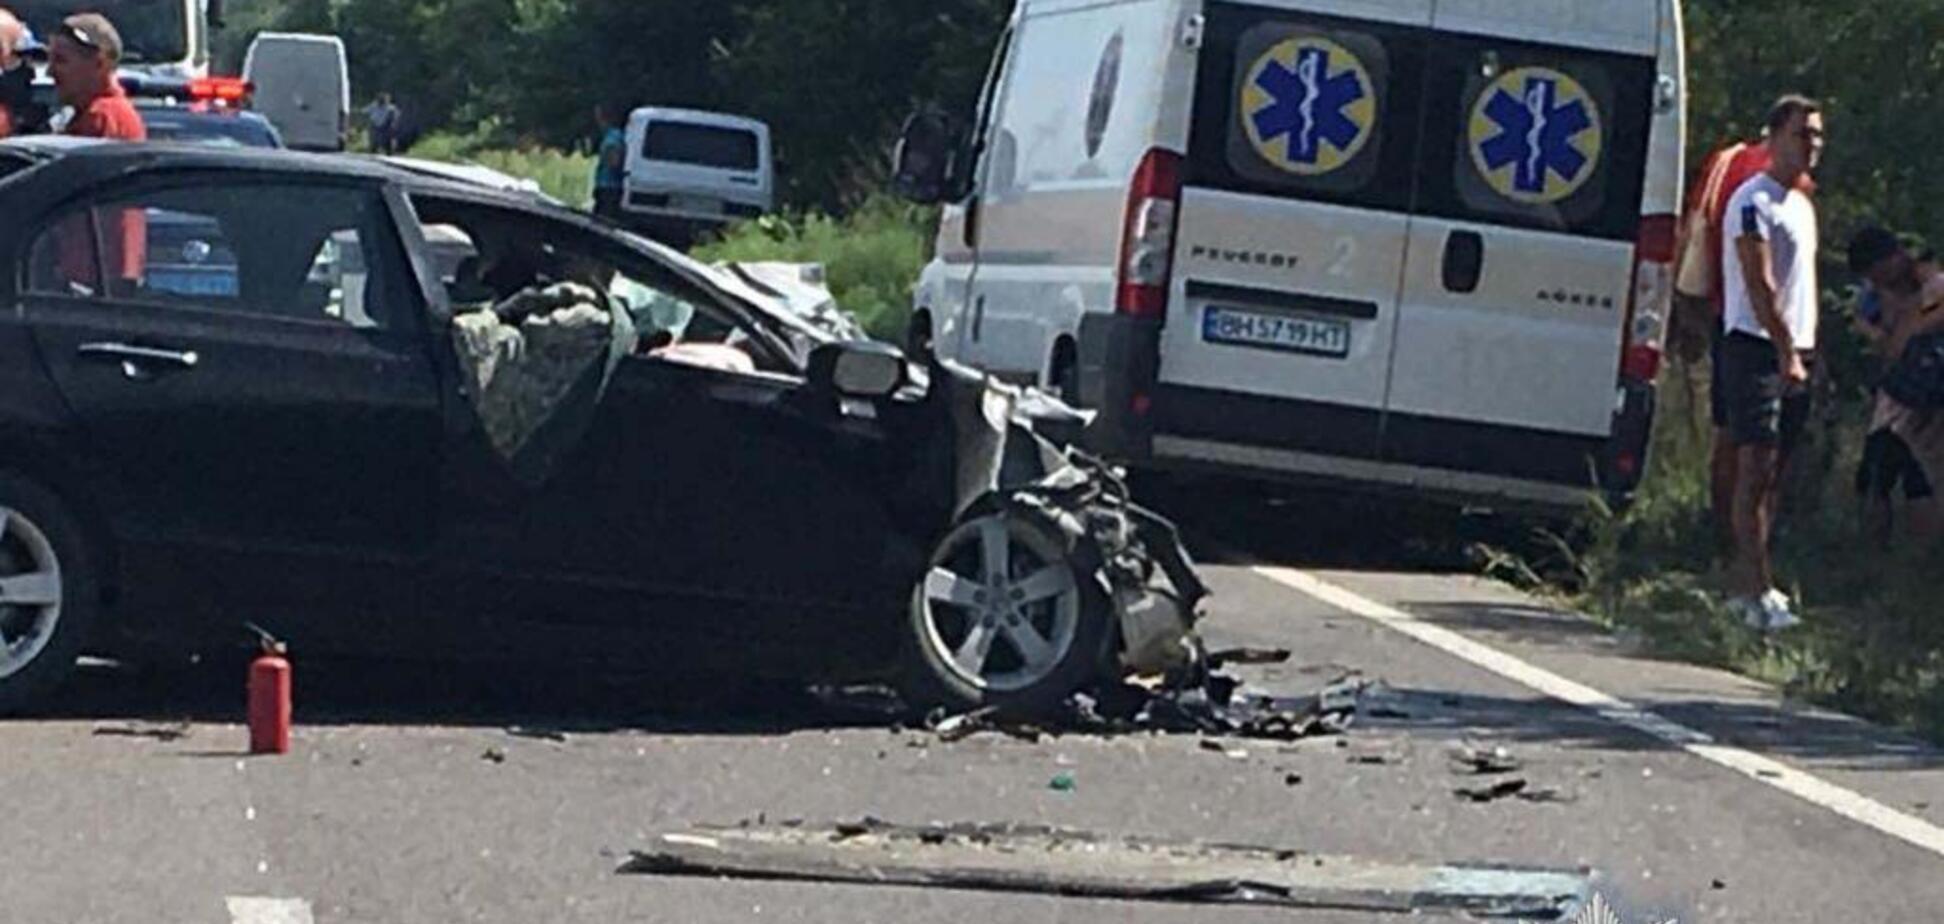 ''Хтось їздить 50 км/год?'' Україні напророкували зростання числа смертельних ДТП